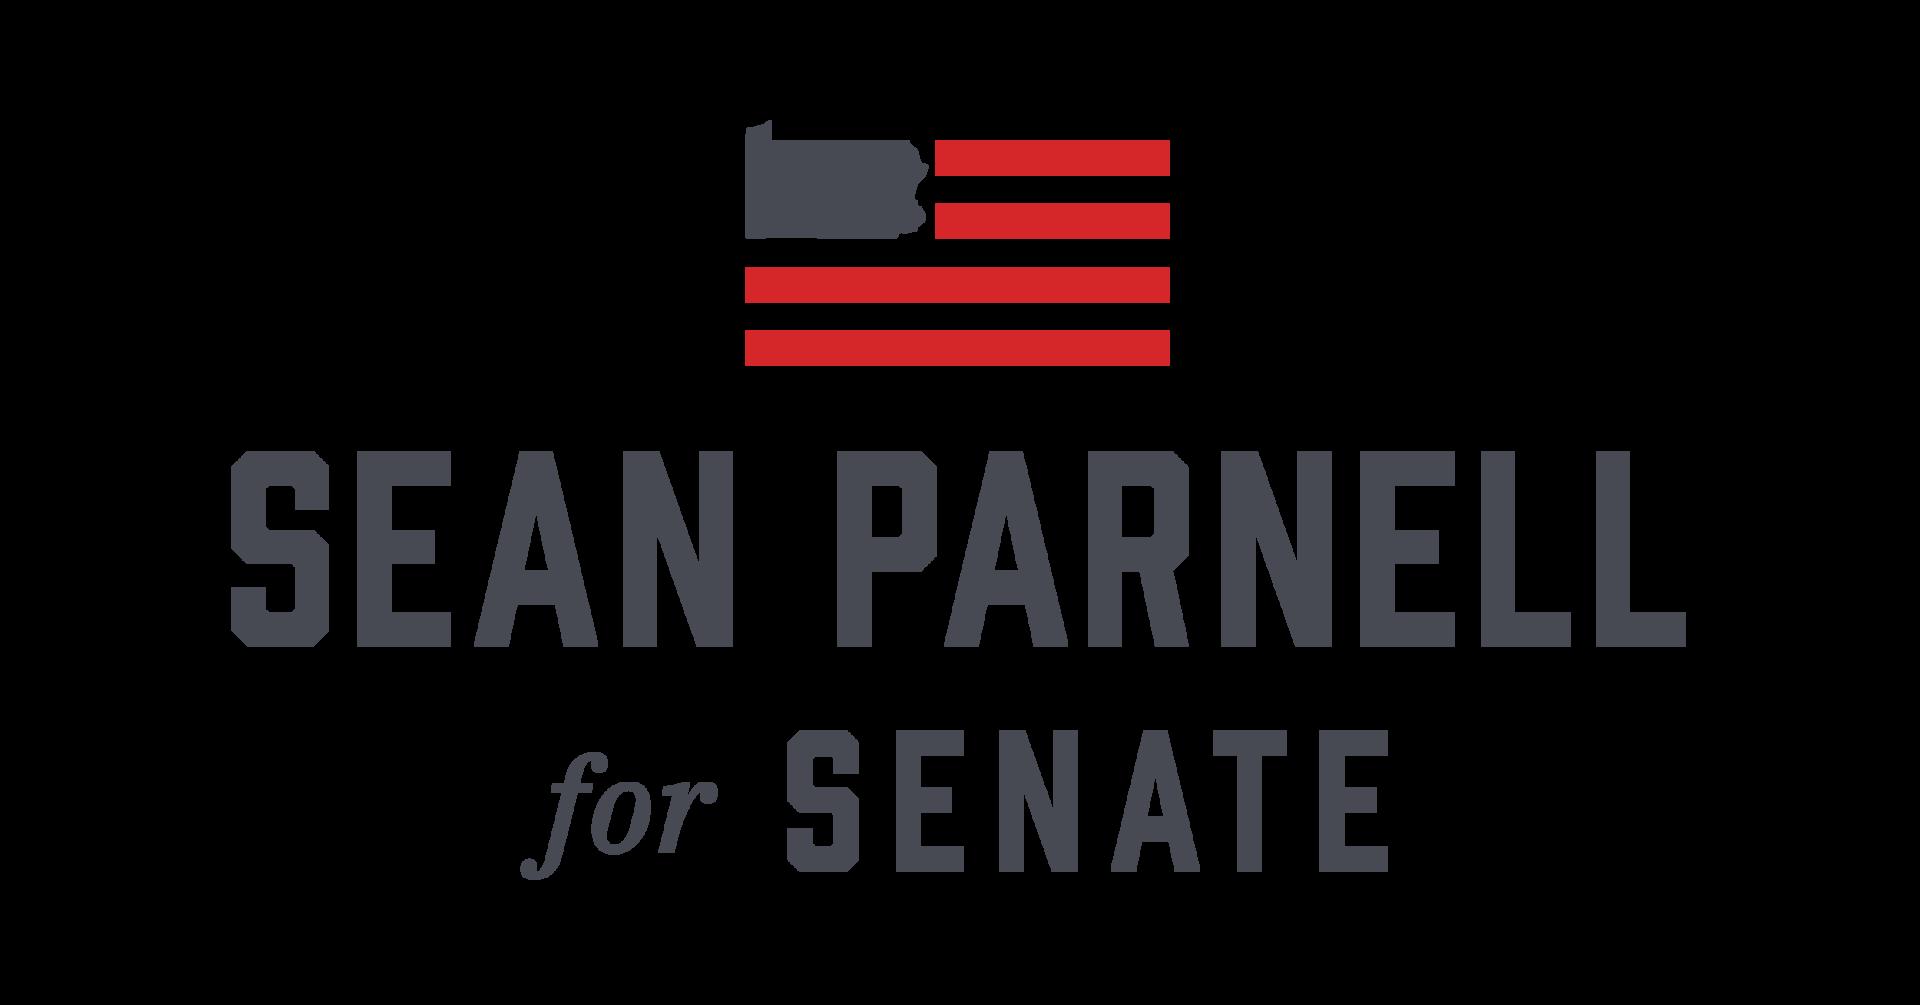 Parnell senate logo 01